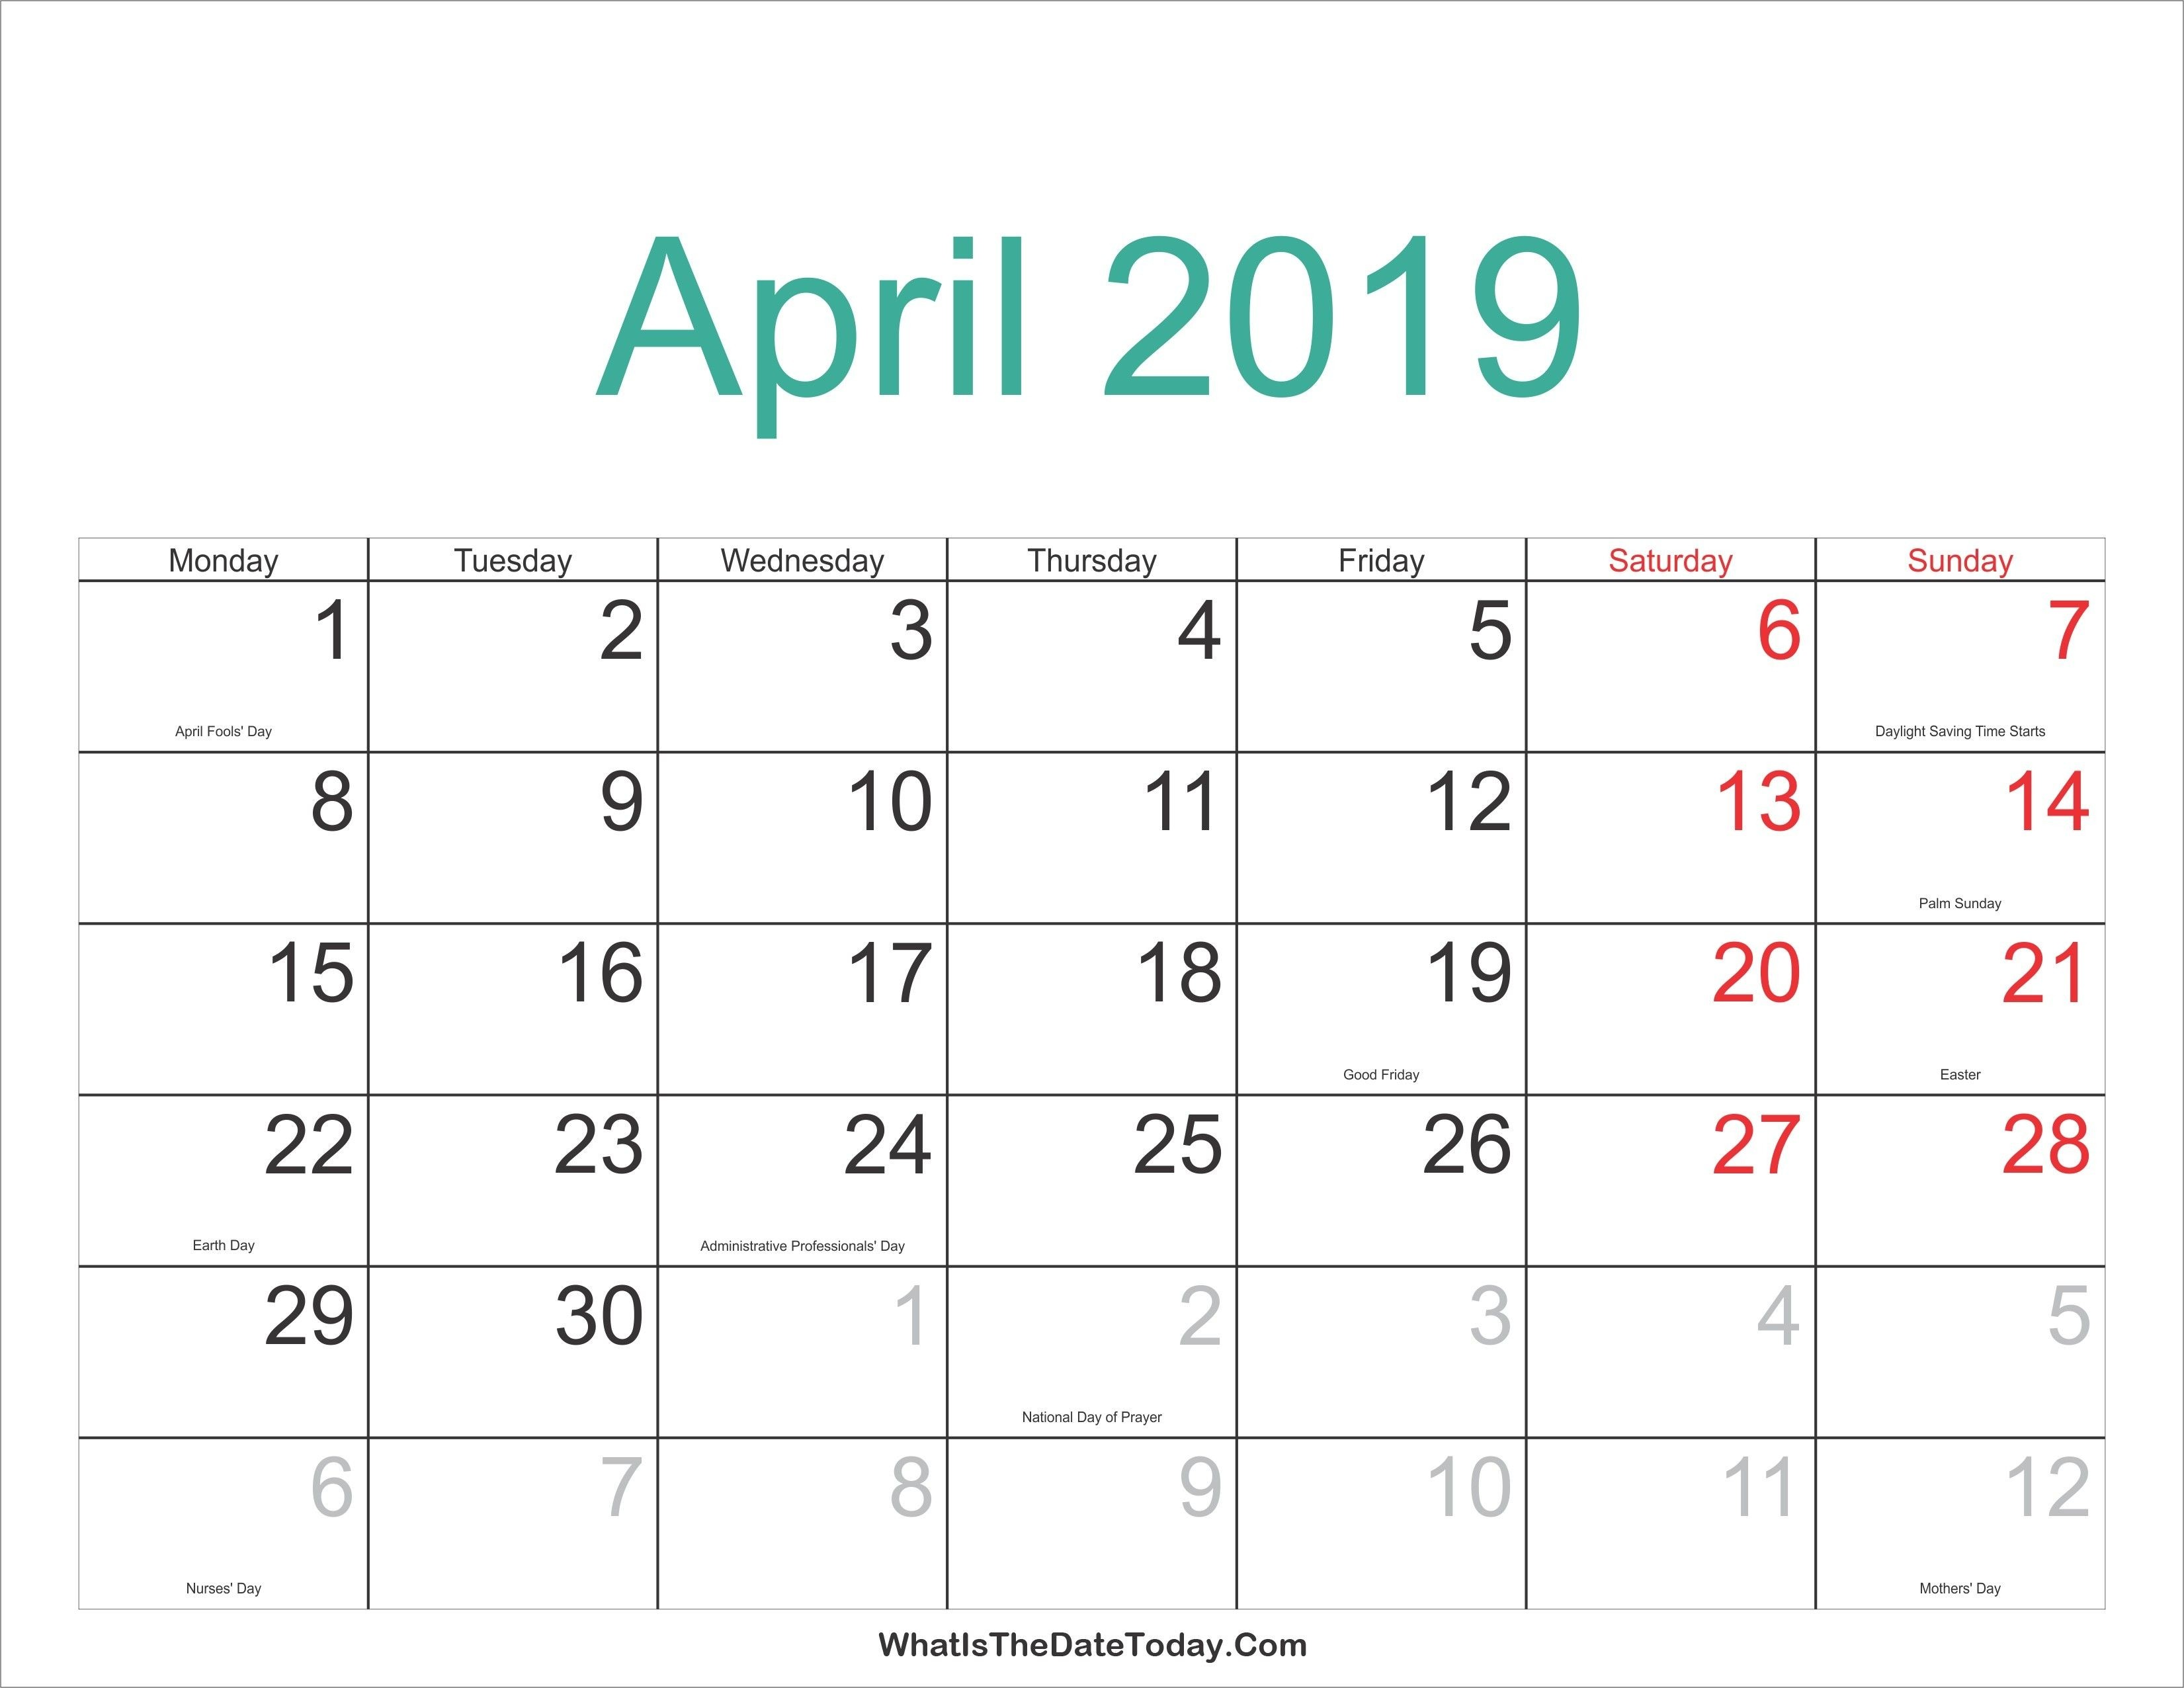 2019 Calendar Singapore Download Más Actual Win Calendar April 2019 solan Ayodhya Of 2019 Calendar Singapore Download Actual March 2019 Calendar Wallpaper Desktop March Calendar Calenda2019